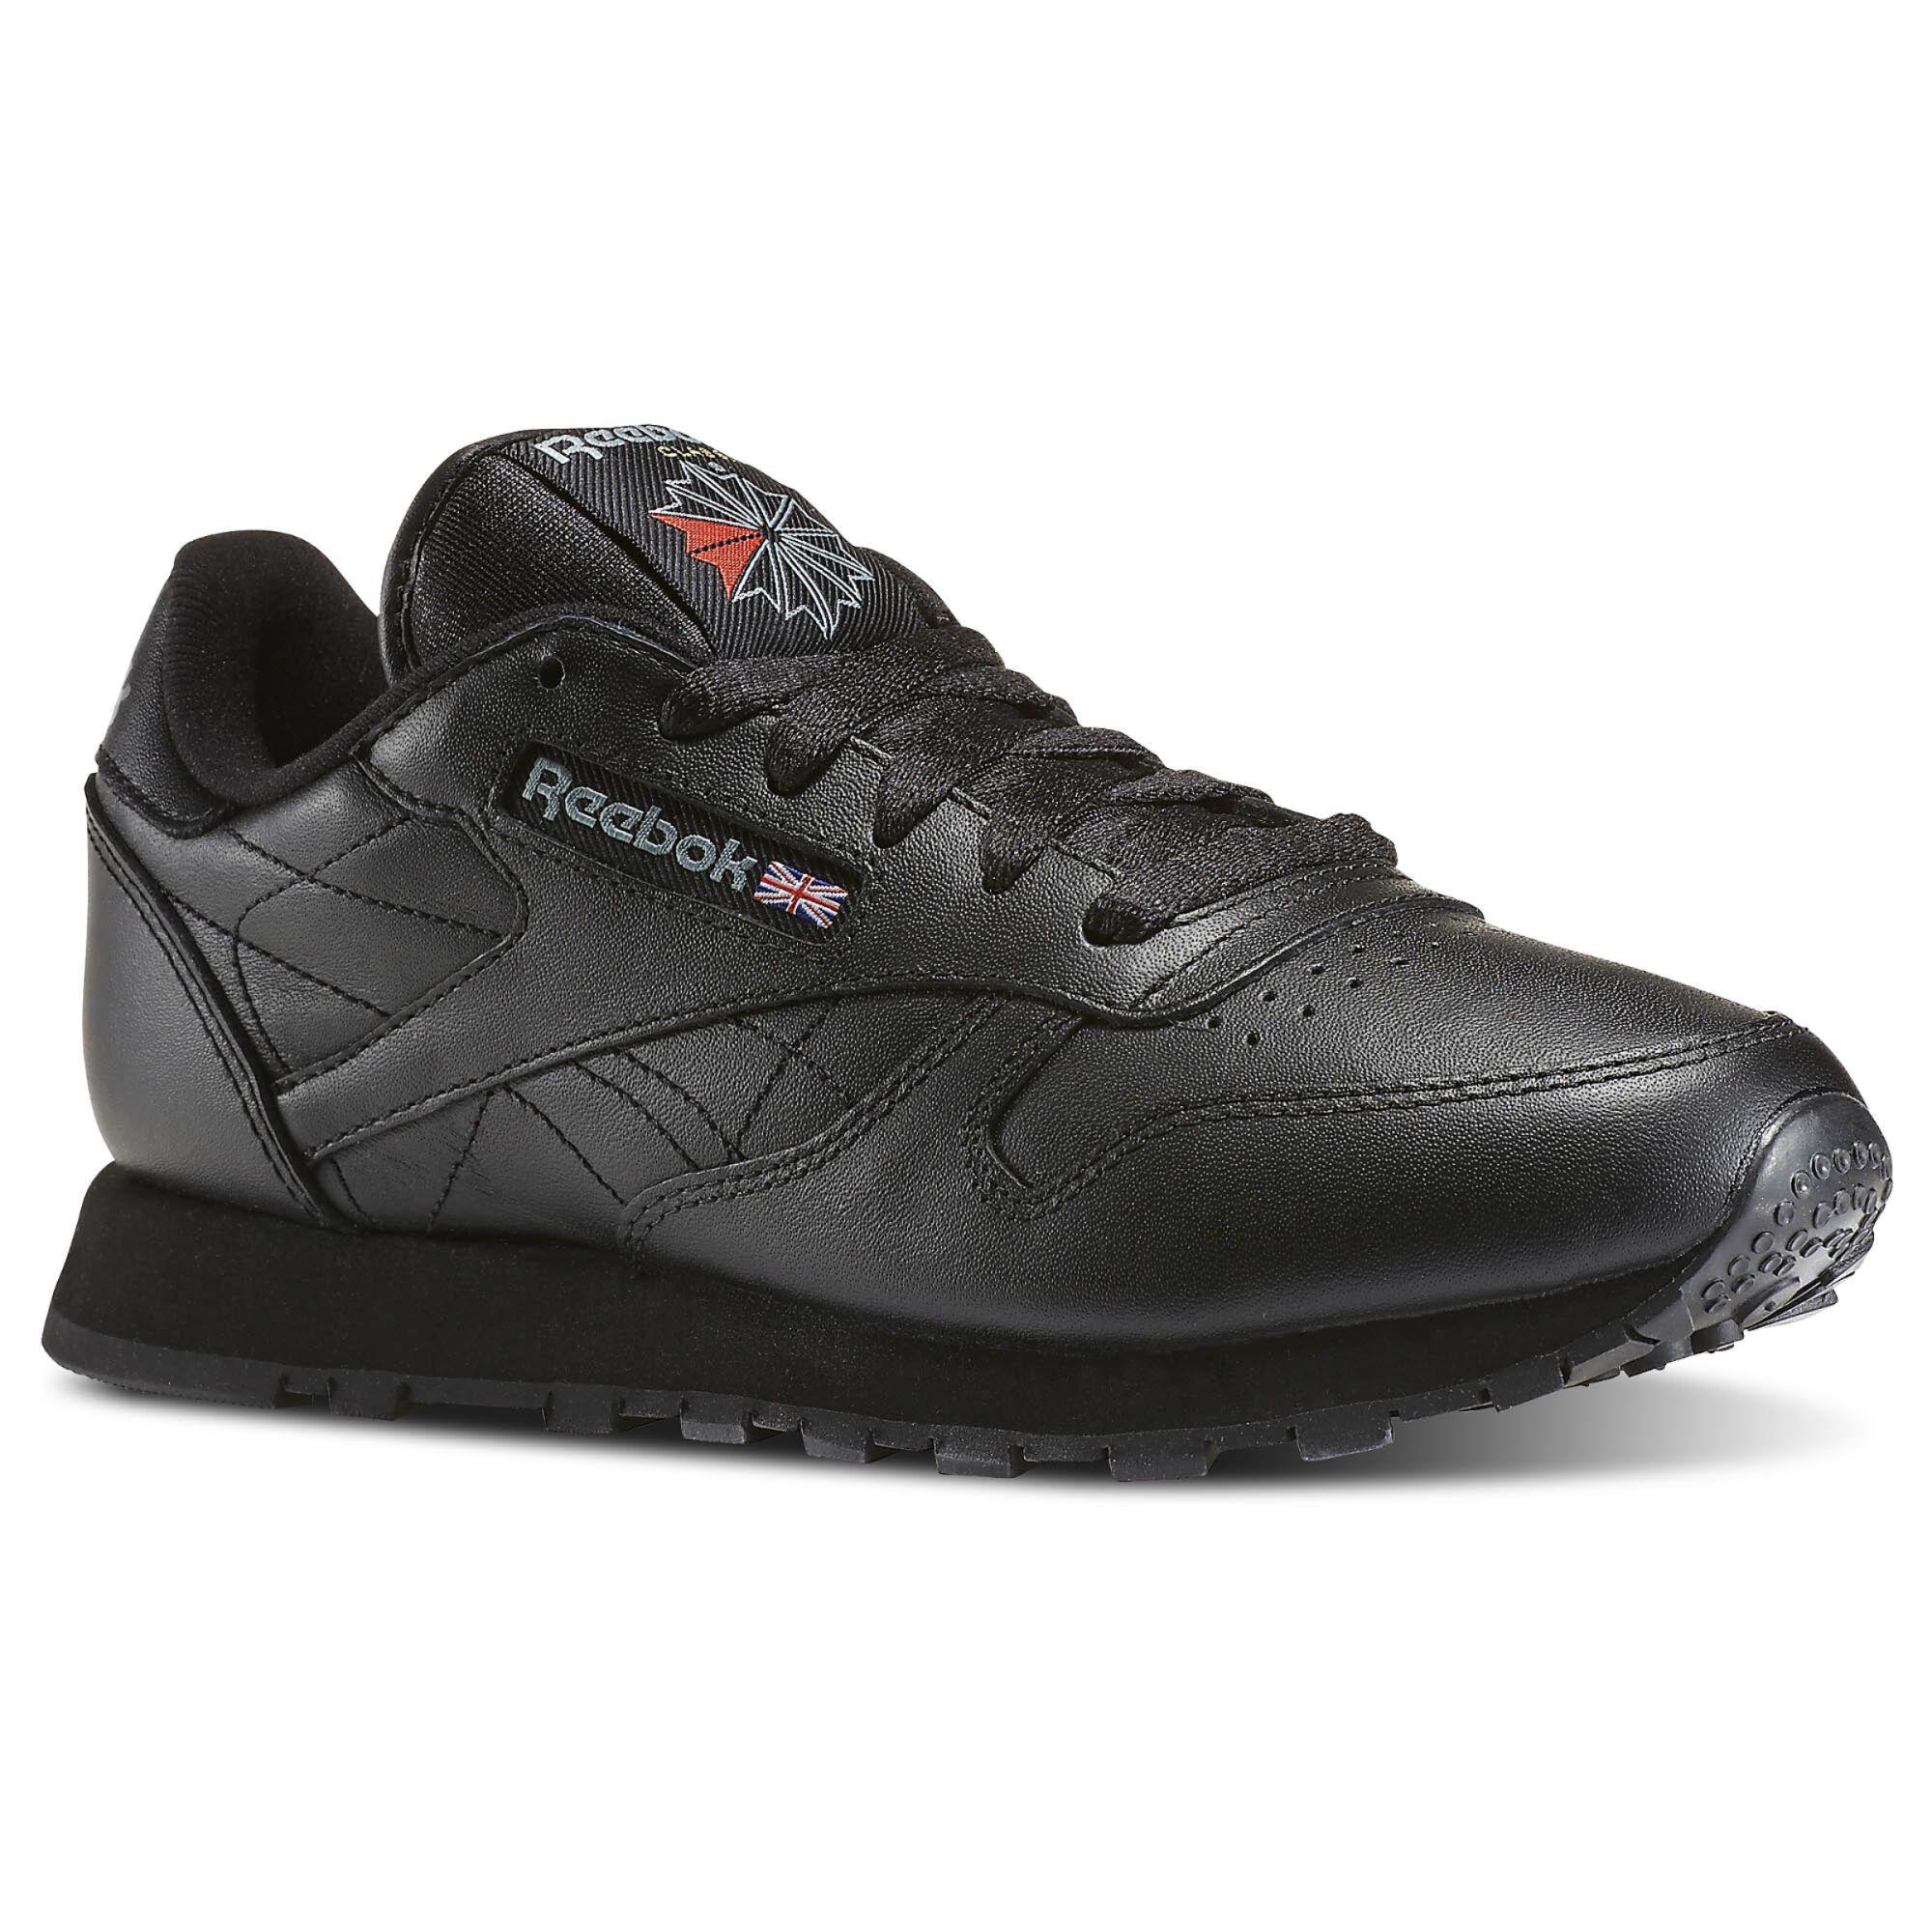 Classic Shoes Retro School Reebok Women's Us Old Shoes ZaX51dqw